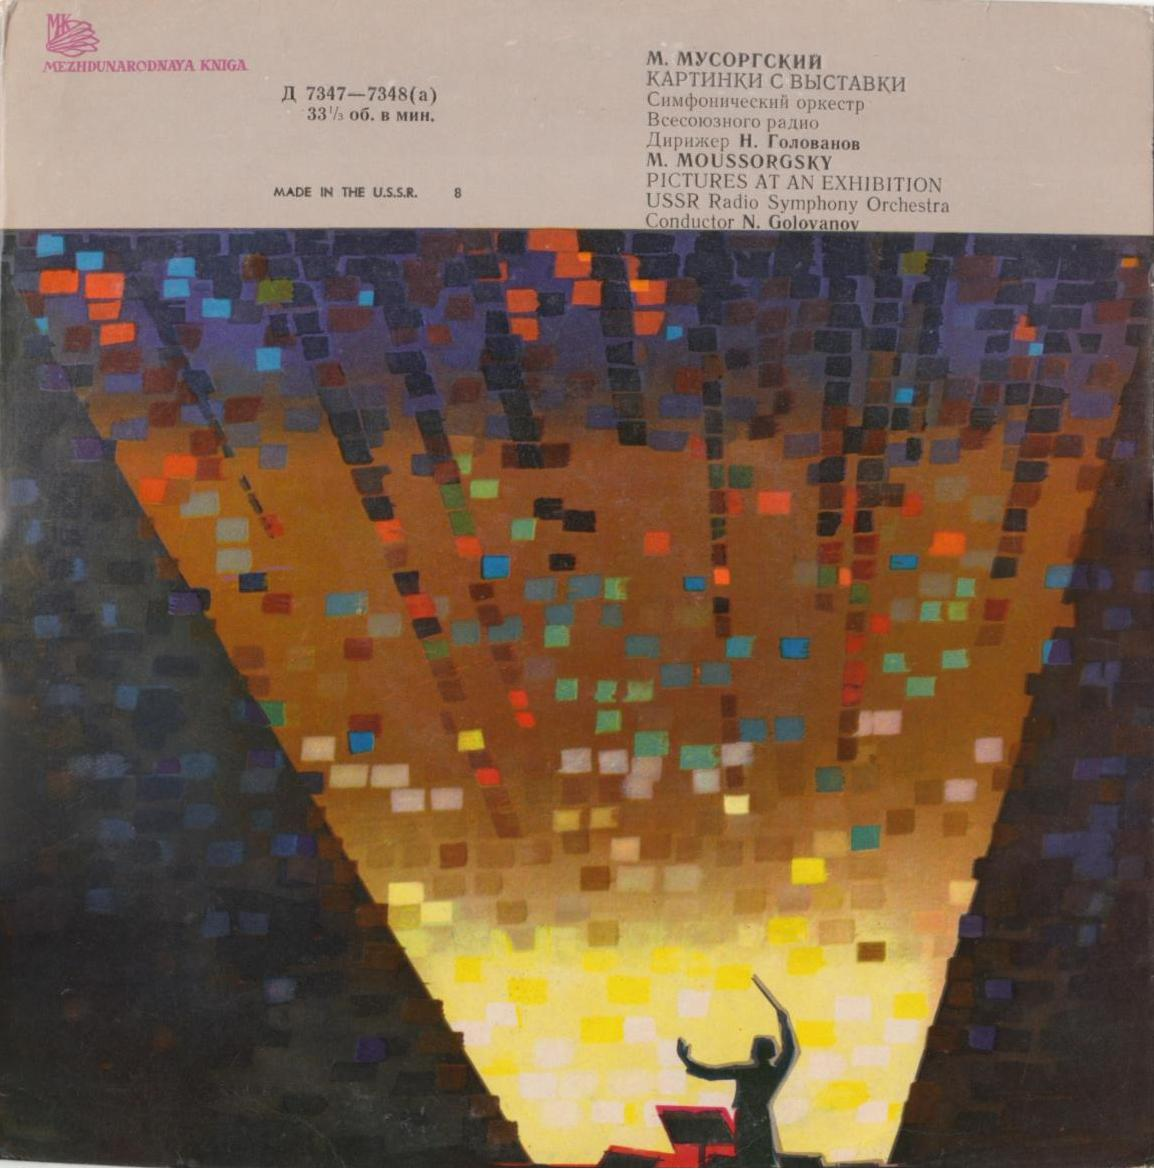 Rimsky Korsakoff Fritz Reiner Chicago Symphony Orchestra Scheherazade